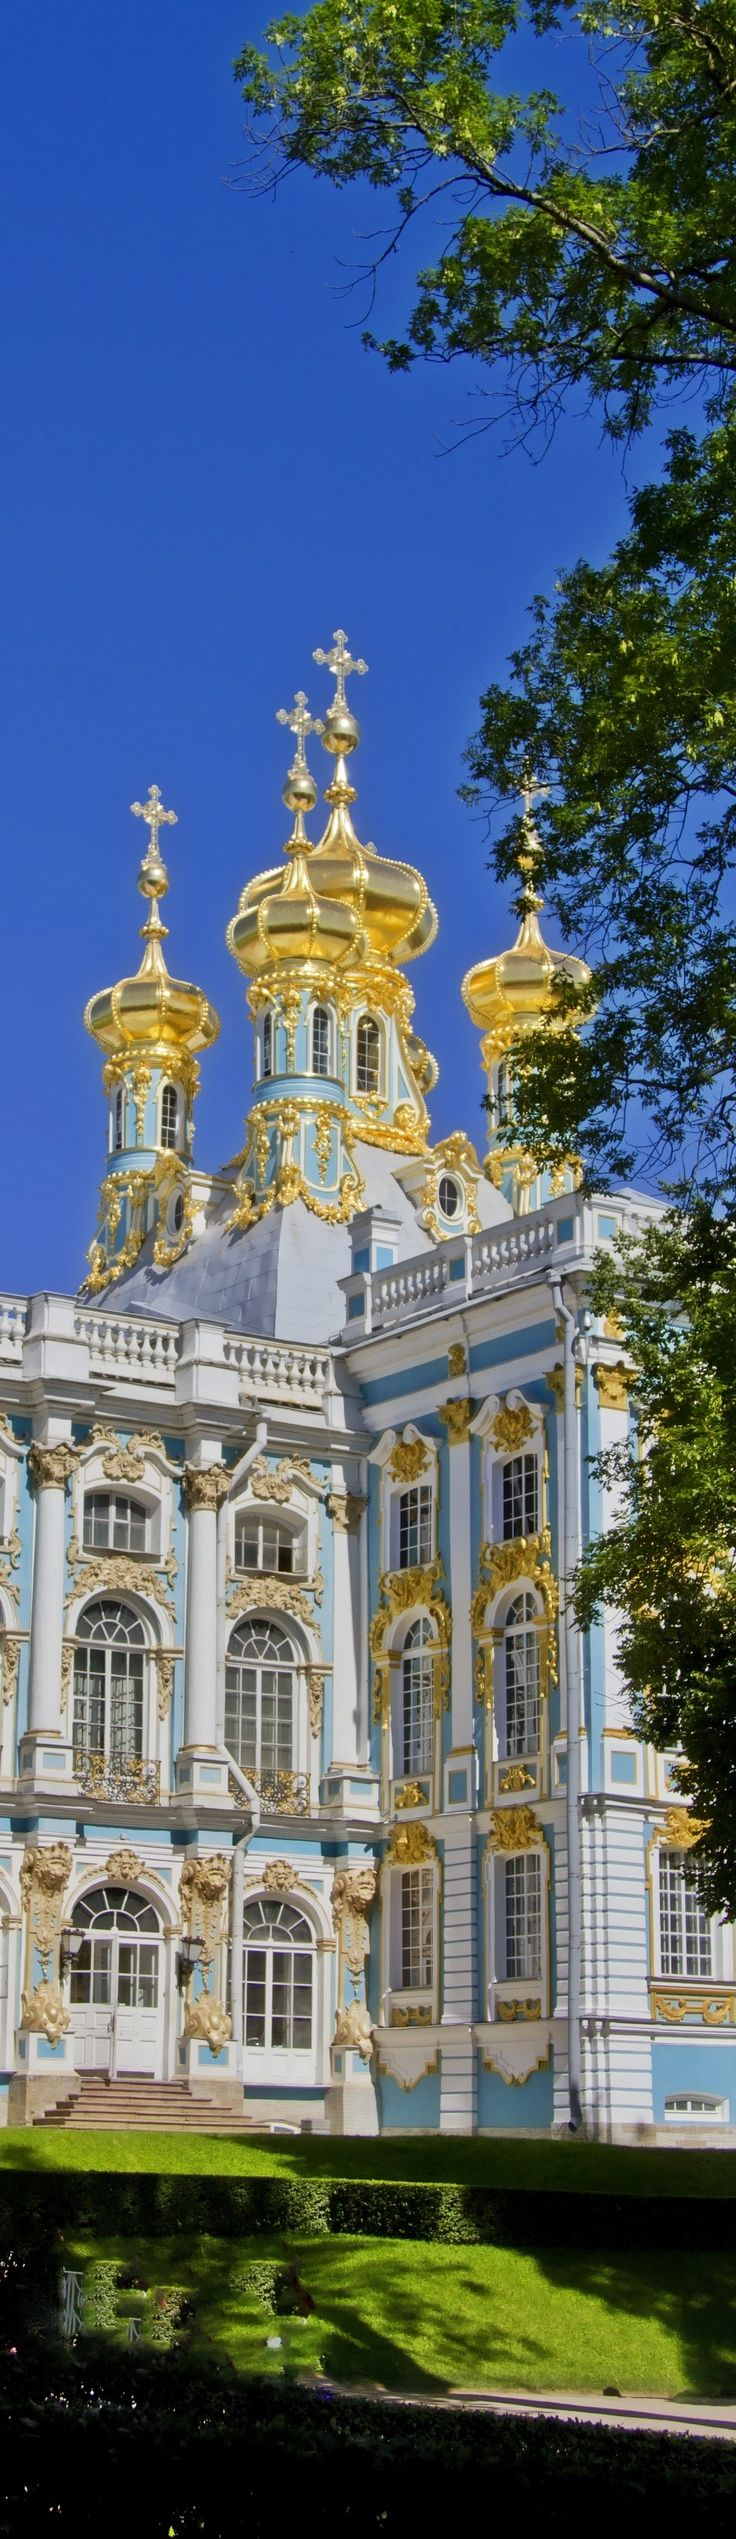 Catherine's Palace in Tsarskoye Selo (Pushkin), south of St. Petersburg, Russia.